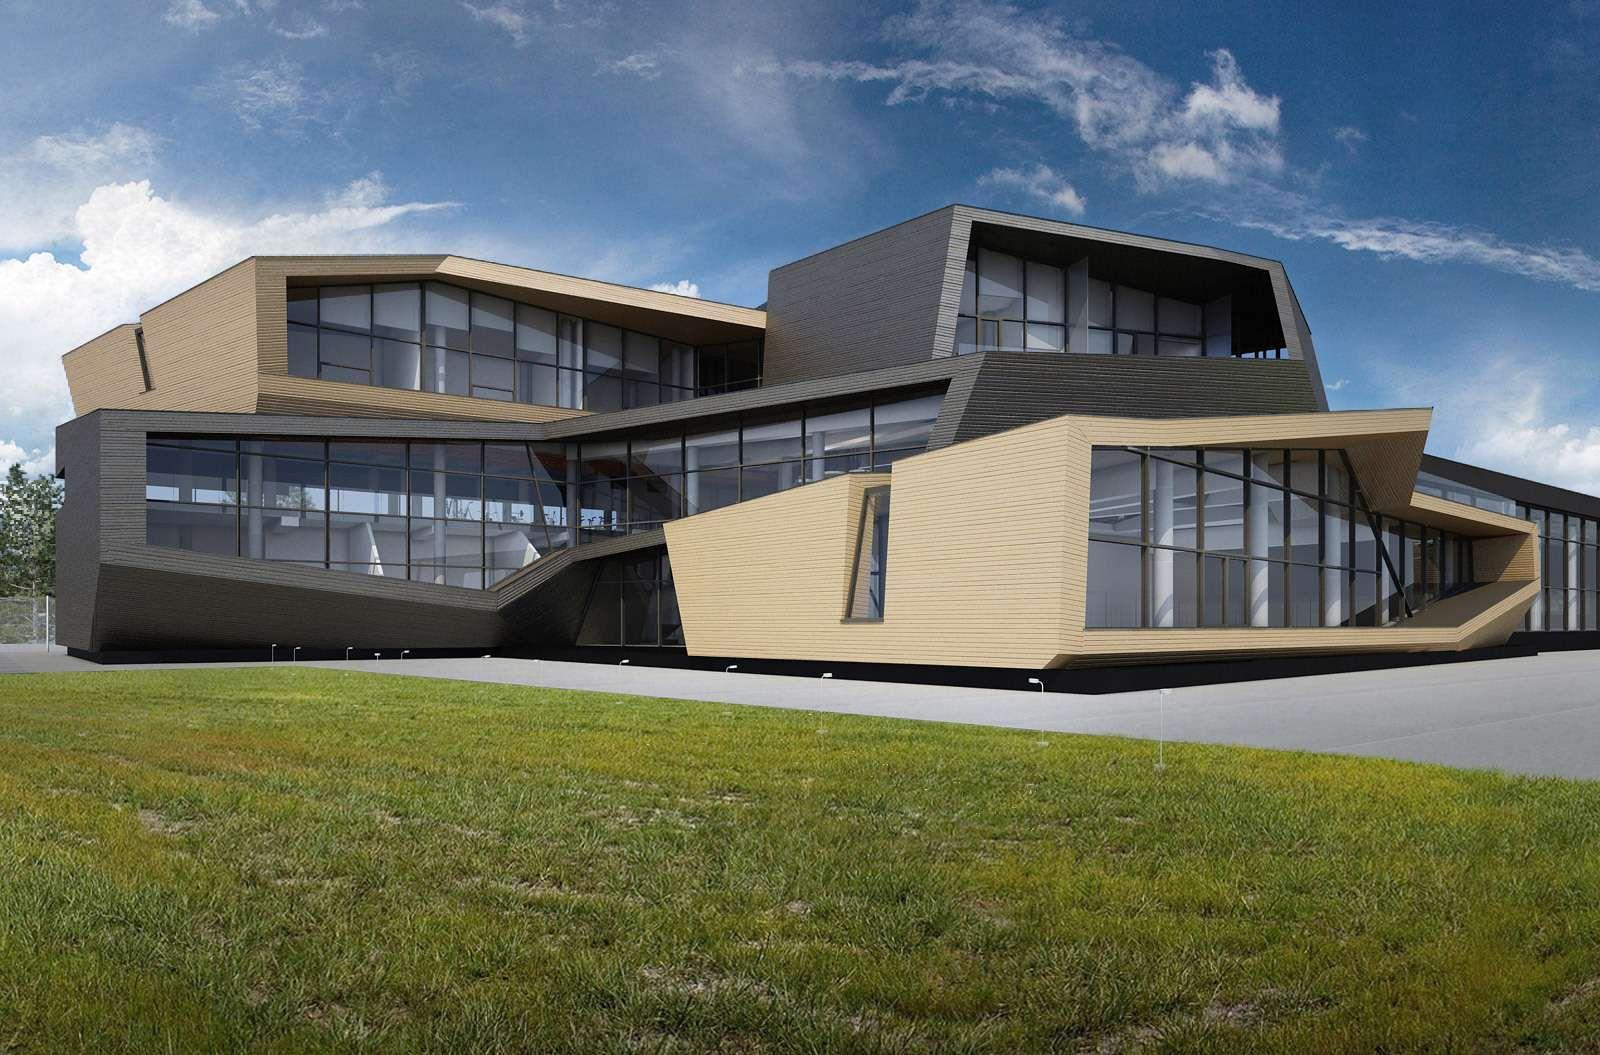 Istra-Tennis-Club-by-Za-Bor-Architects-03.jpg (JPEG Image, 1600×1055 pixels) - Scaled (63%)